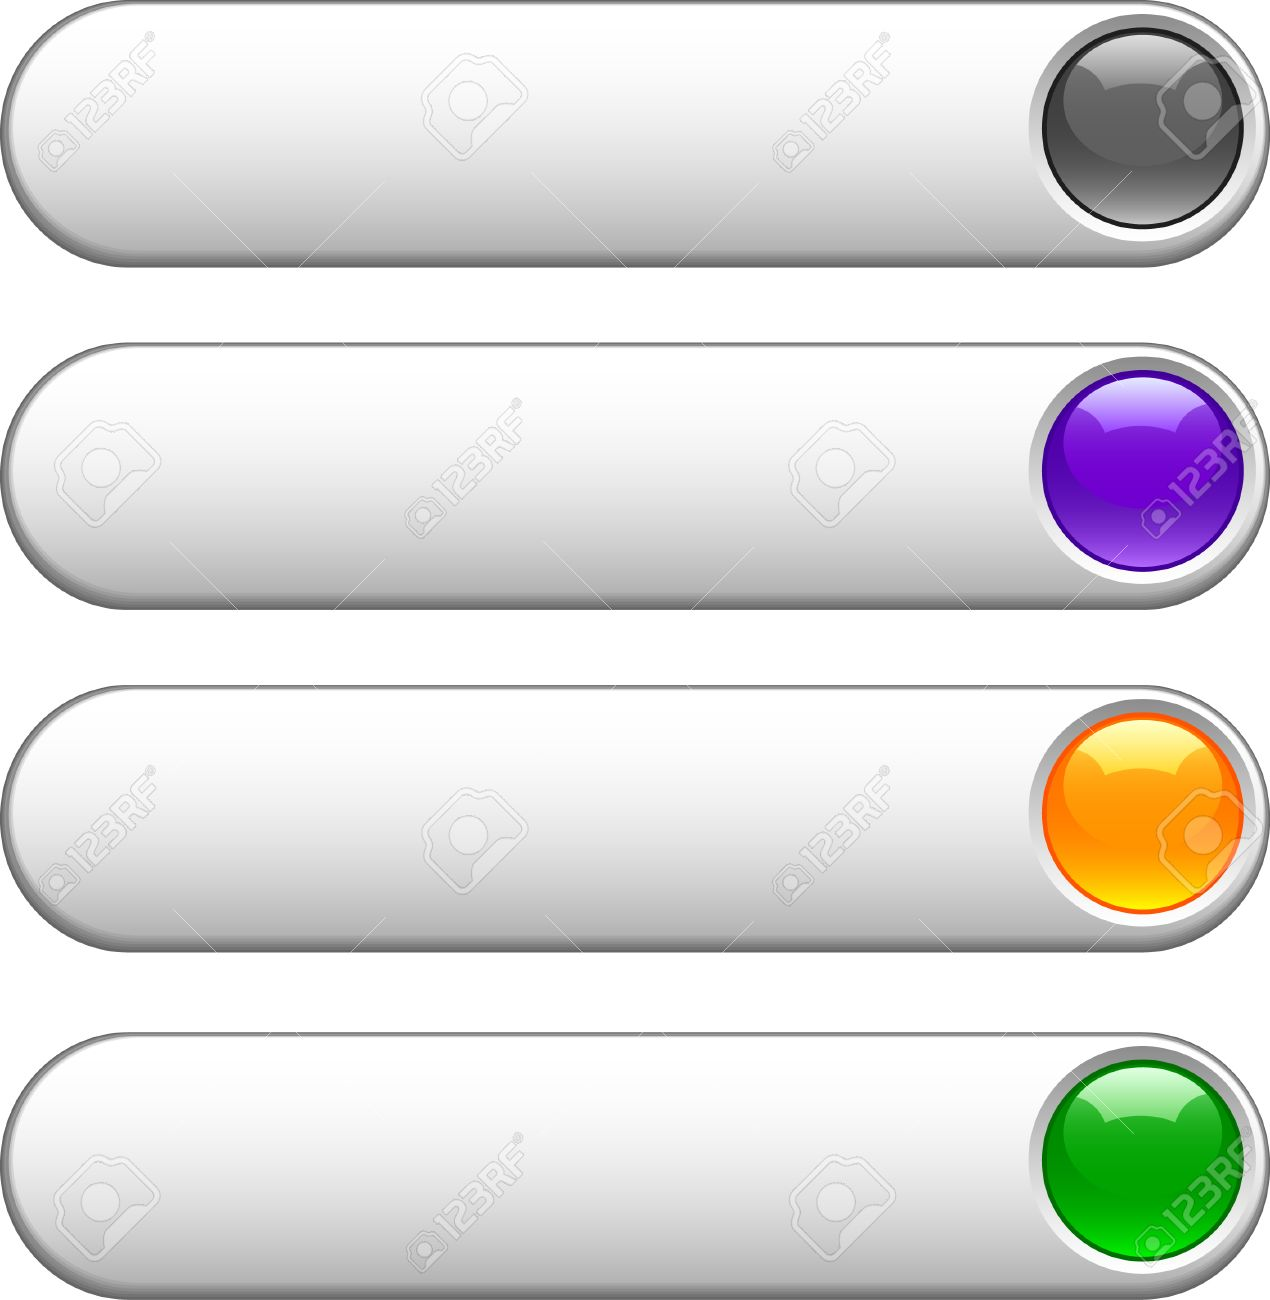 Internet shiny buttons. Vector illustration. Stock Vector - 4530212